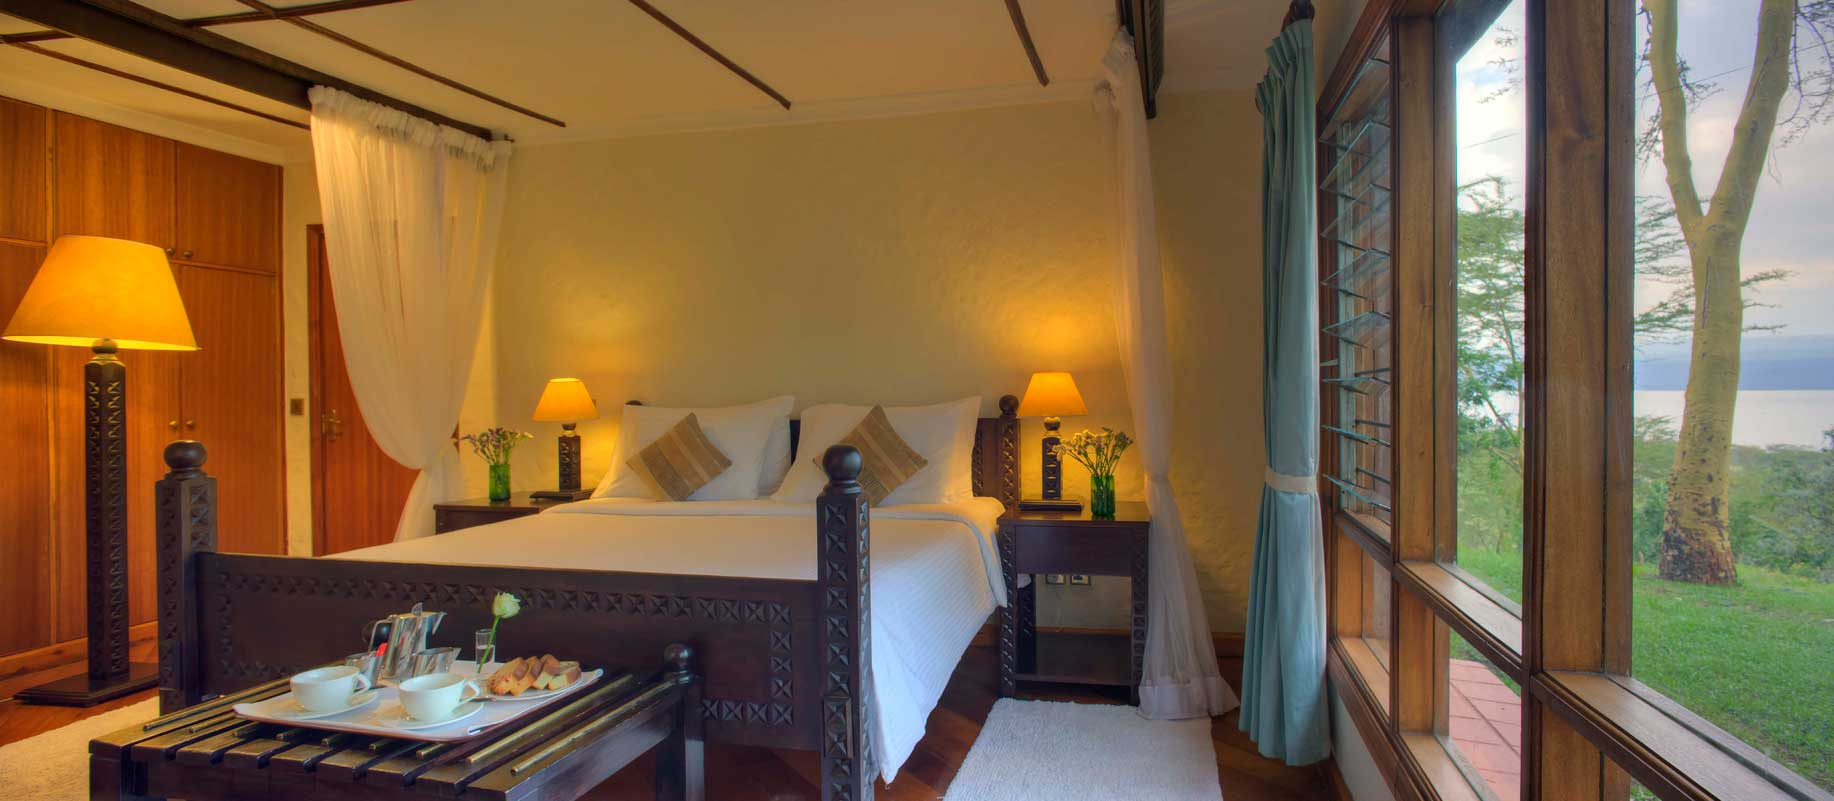 faru-suite-banner_chui-and-faru-suites